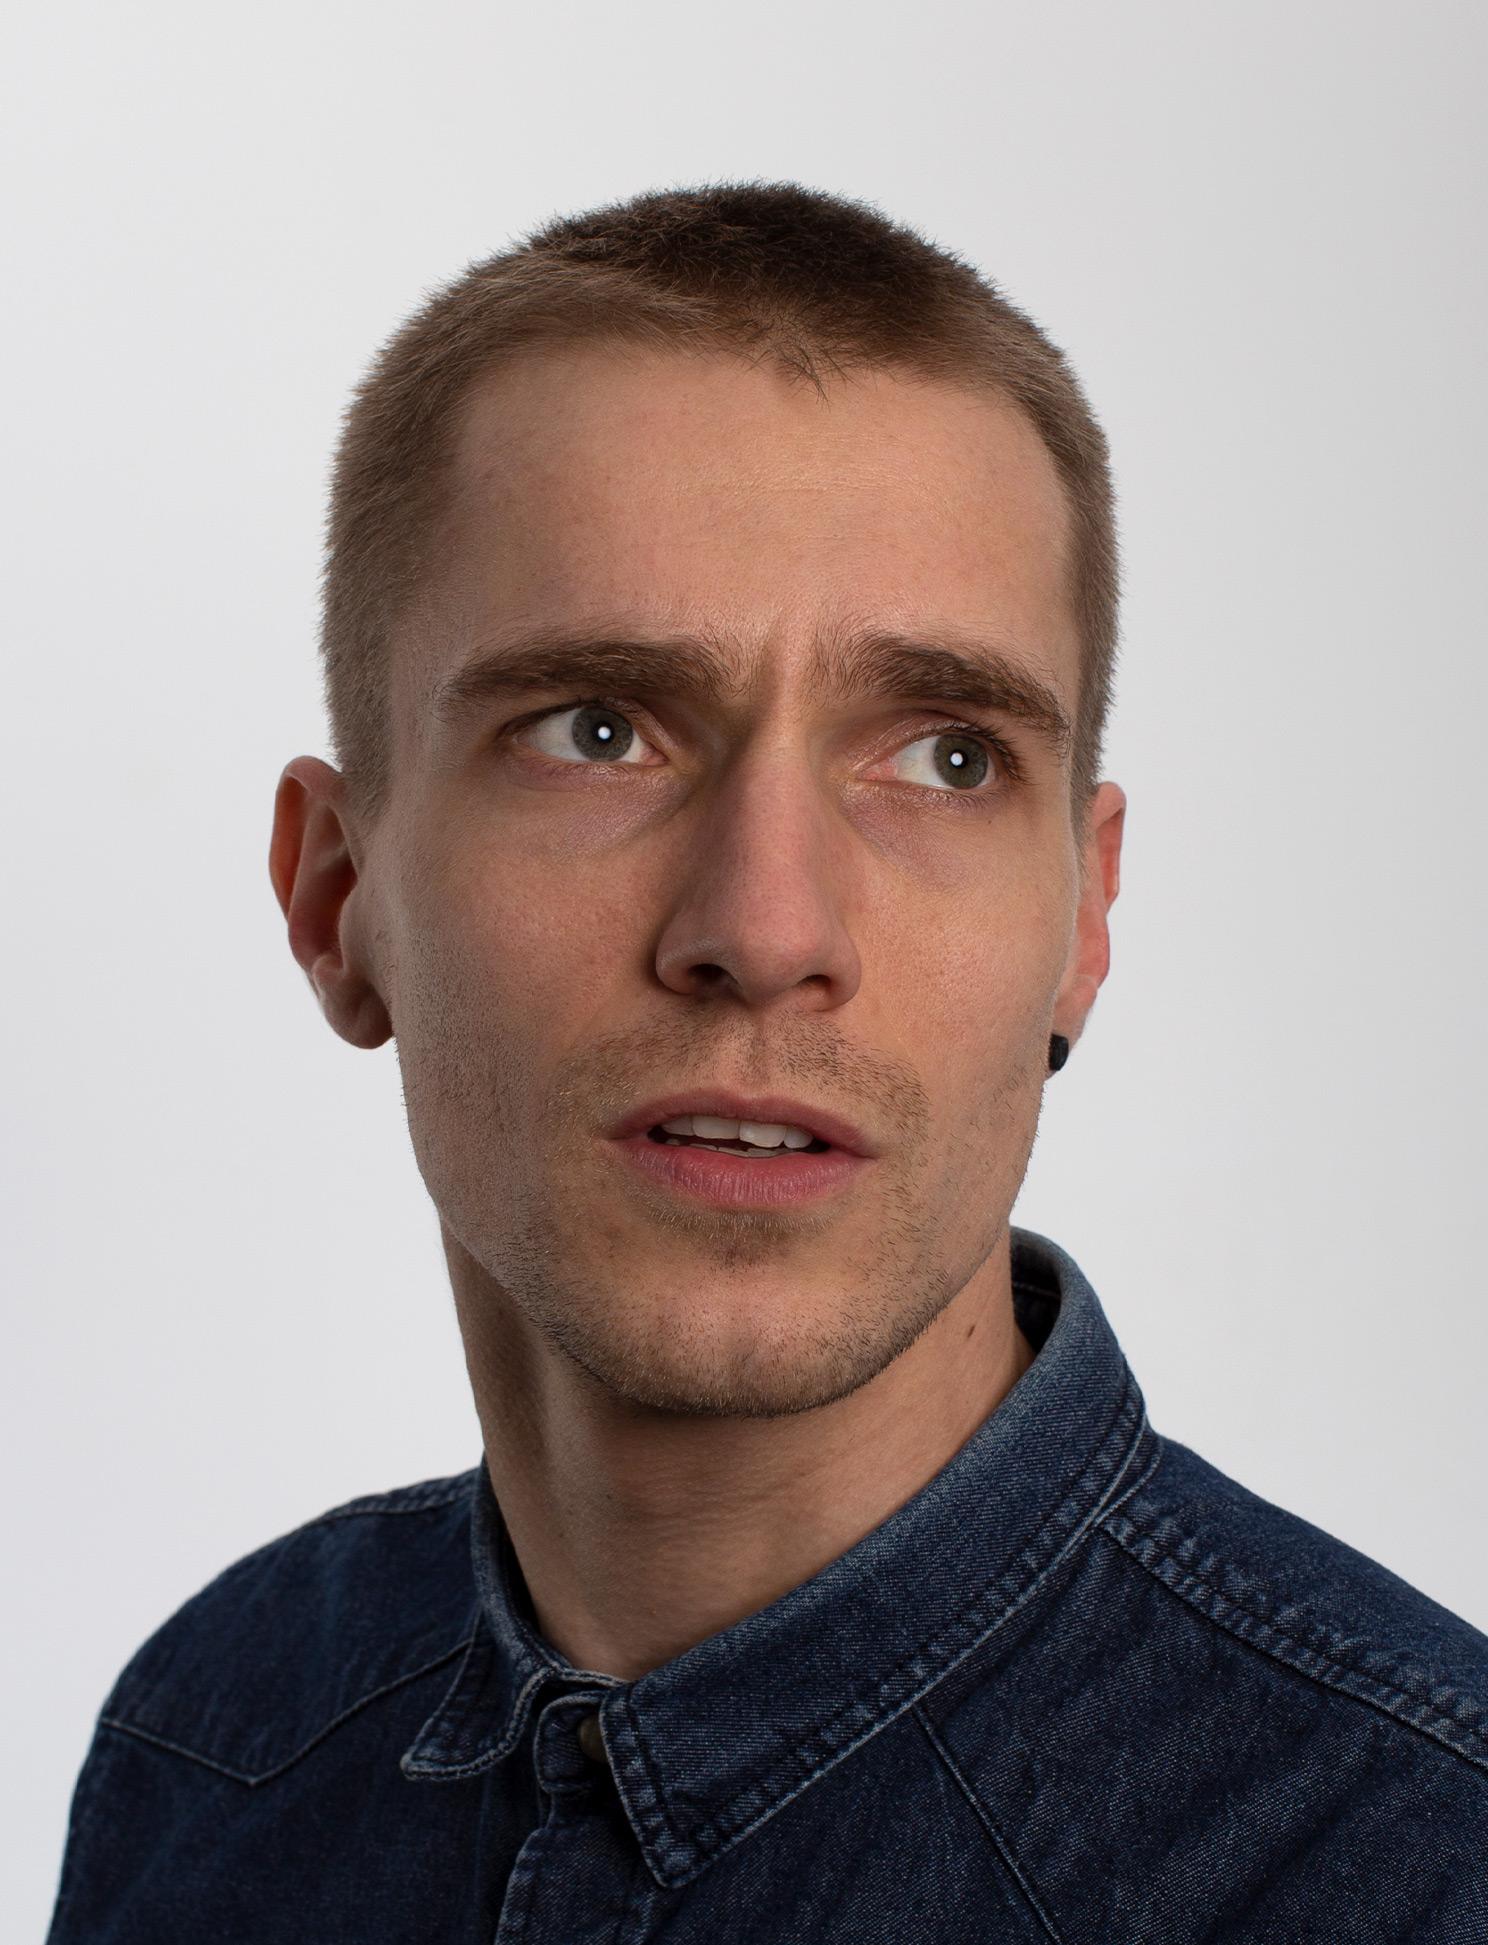 portrait-staand